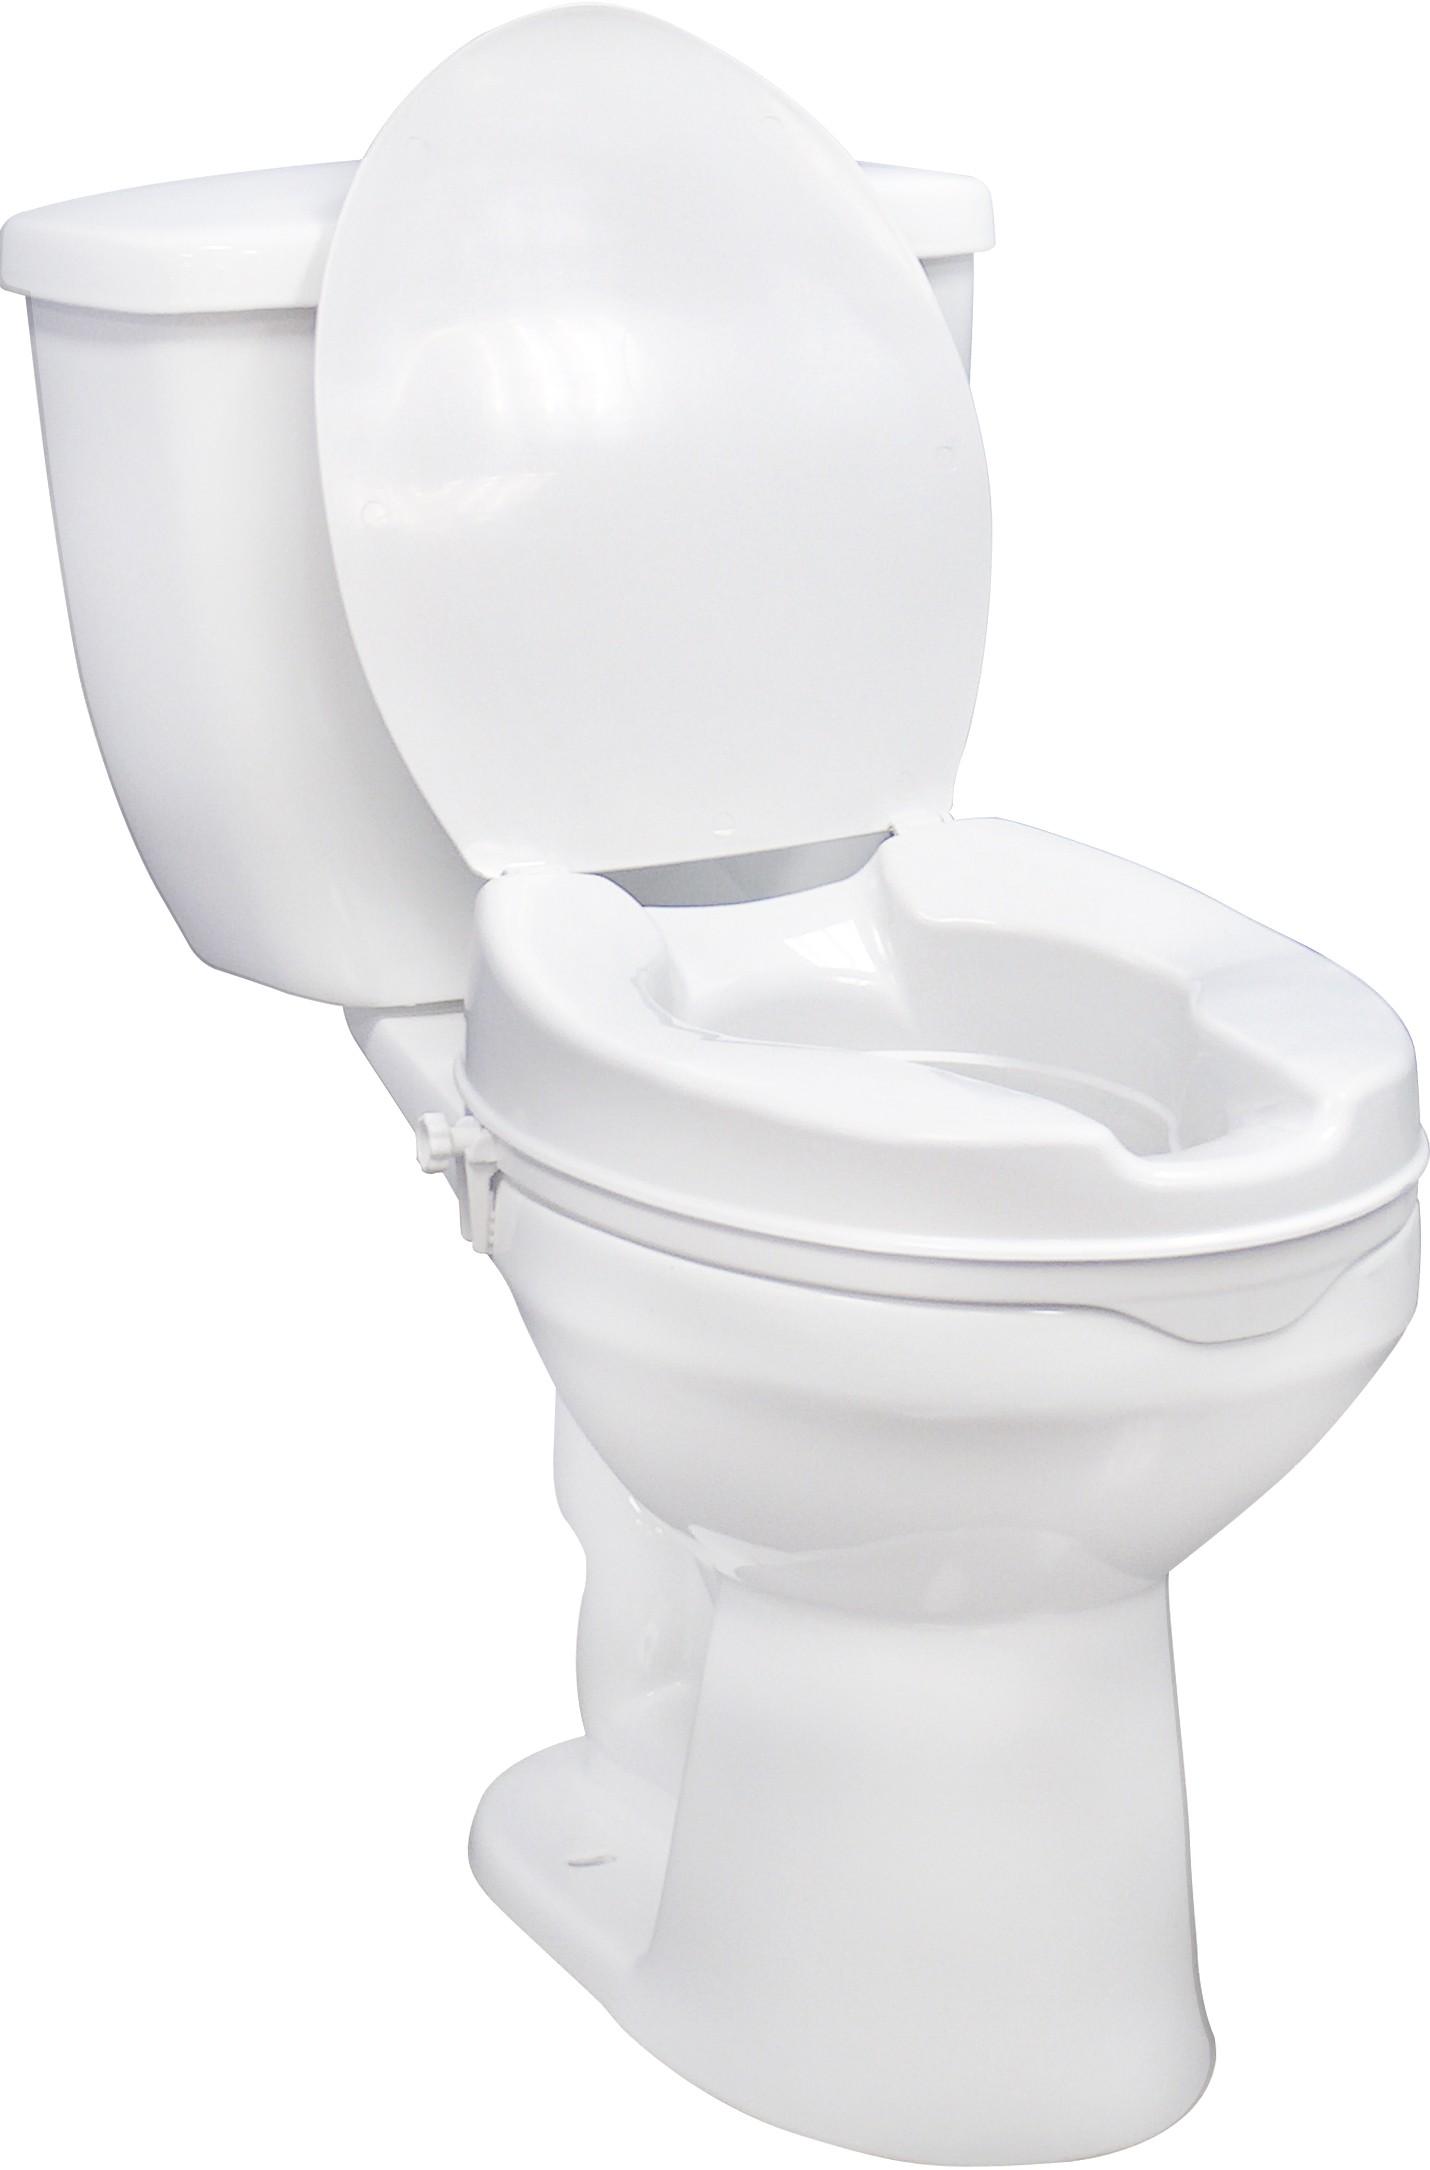 Enjoyable 2 Raised Toilet Seat With Lid Creativecarmelina Interior Chair Design Creativecarmelinacom